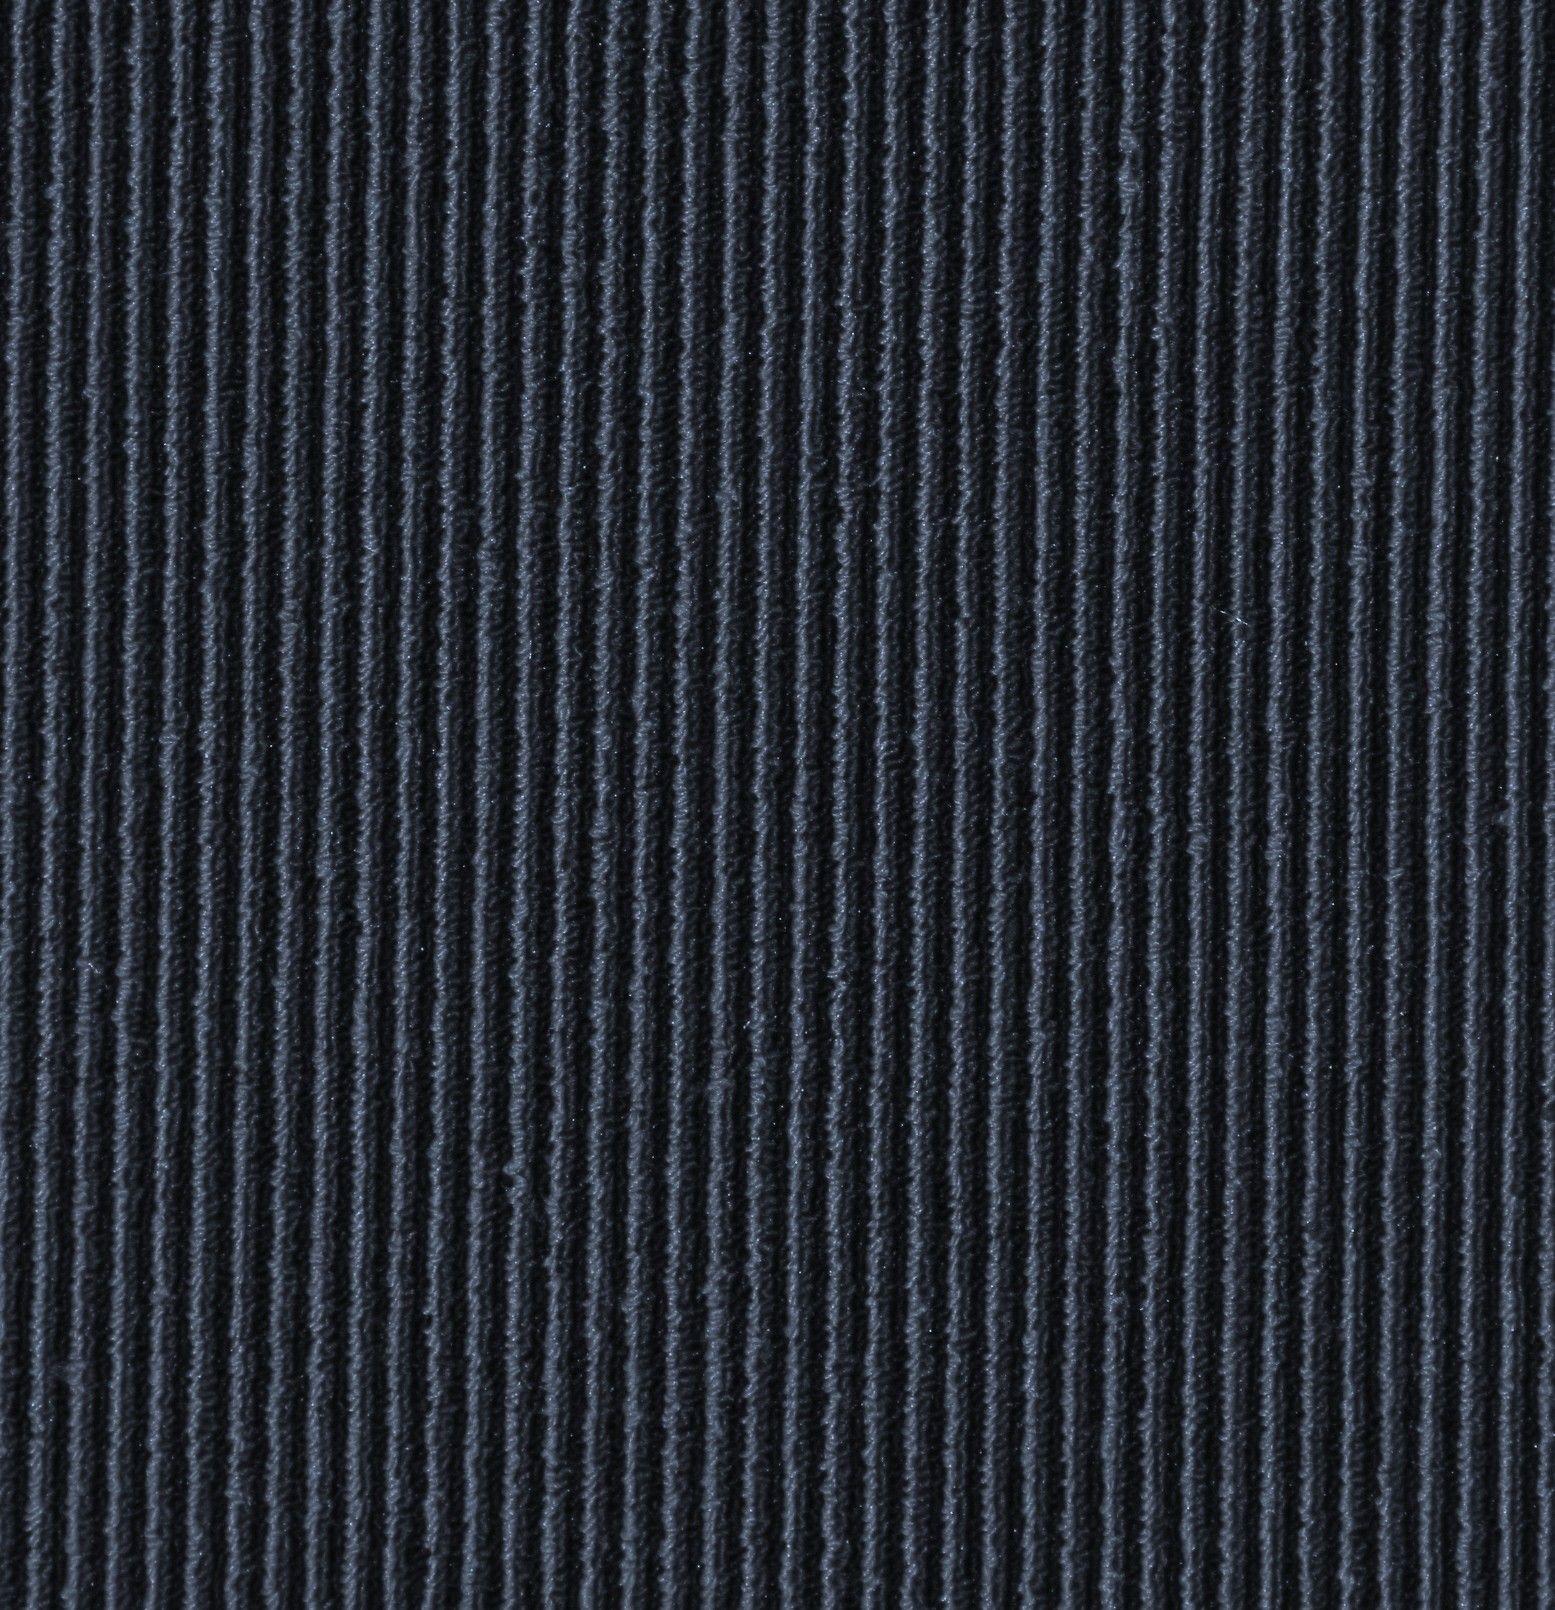 Terrace Garden Charcoal Inch Tile Featured Carpet - Bulk tile warehouse